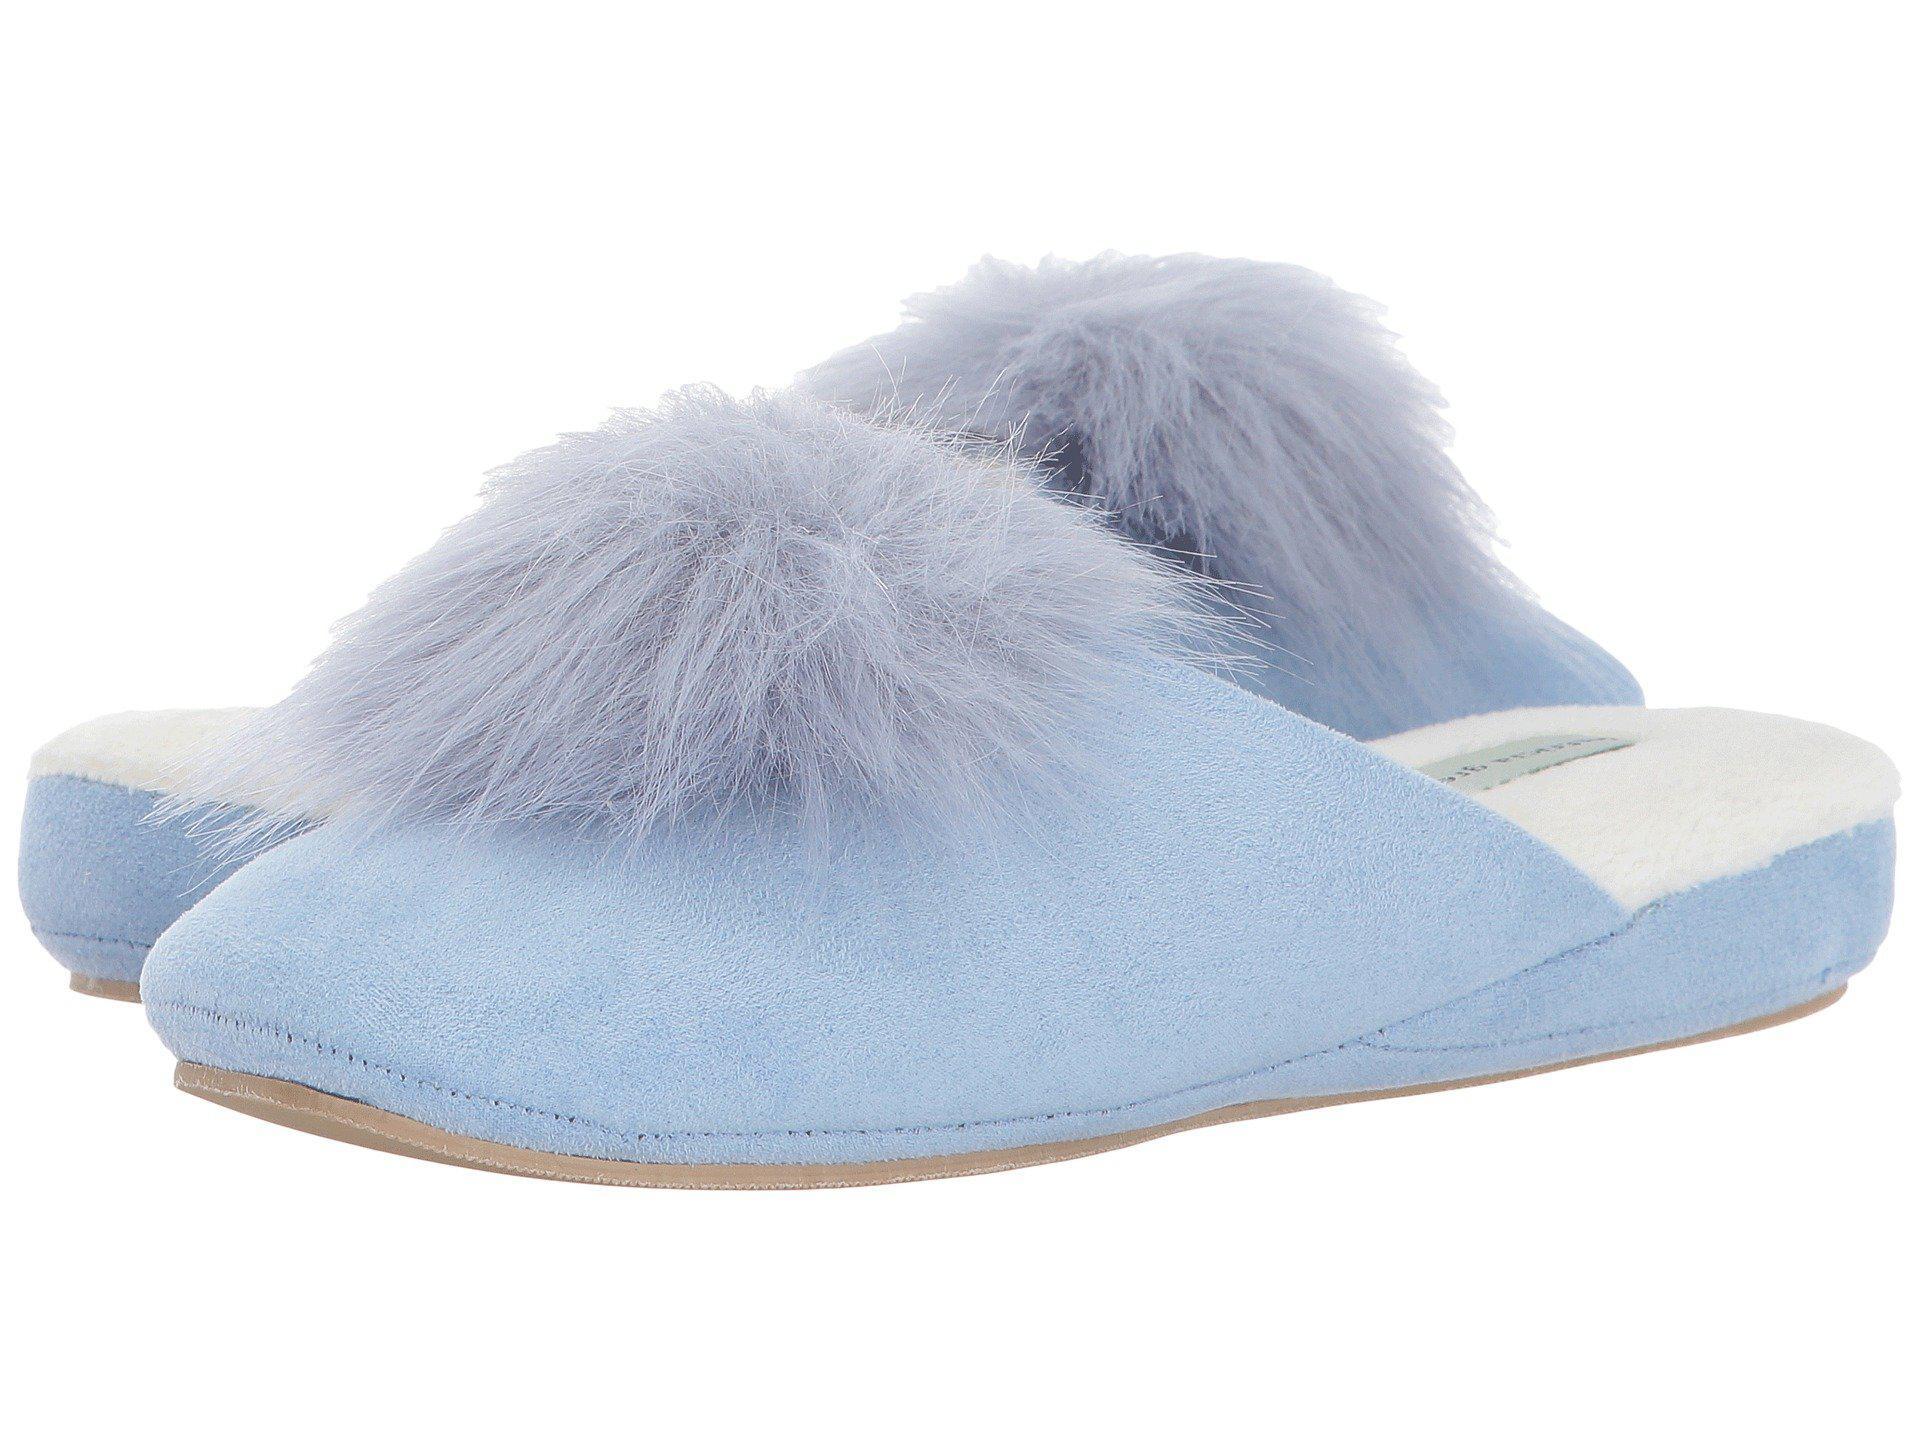 535f36981 Lyst - Patricia Green Pretty Pouf (black) Women s Slippers in Blue